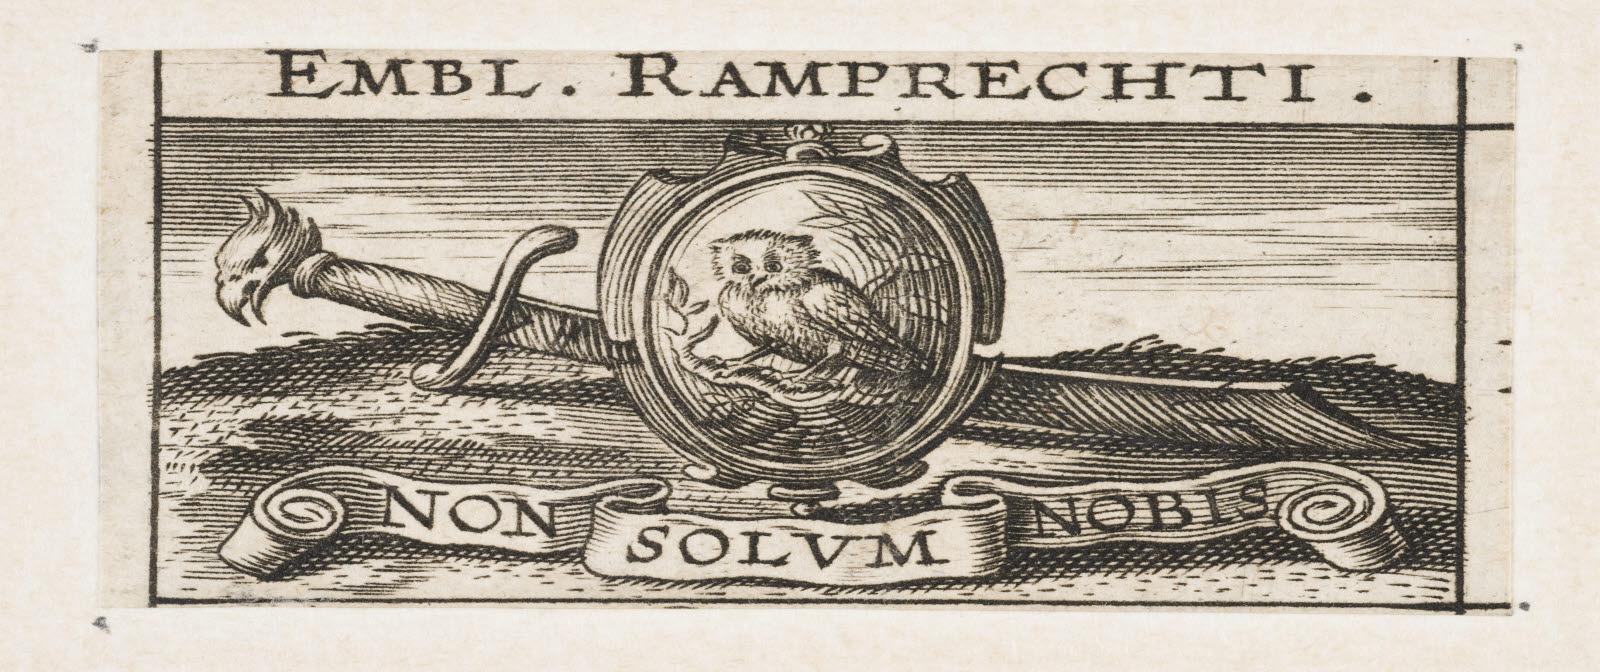 Emblème de Ramprecht_0